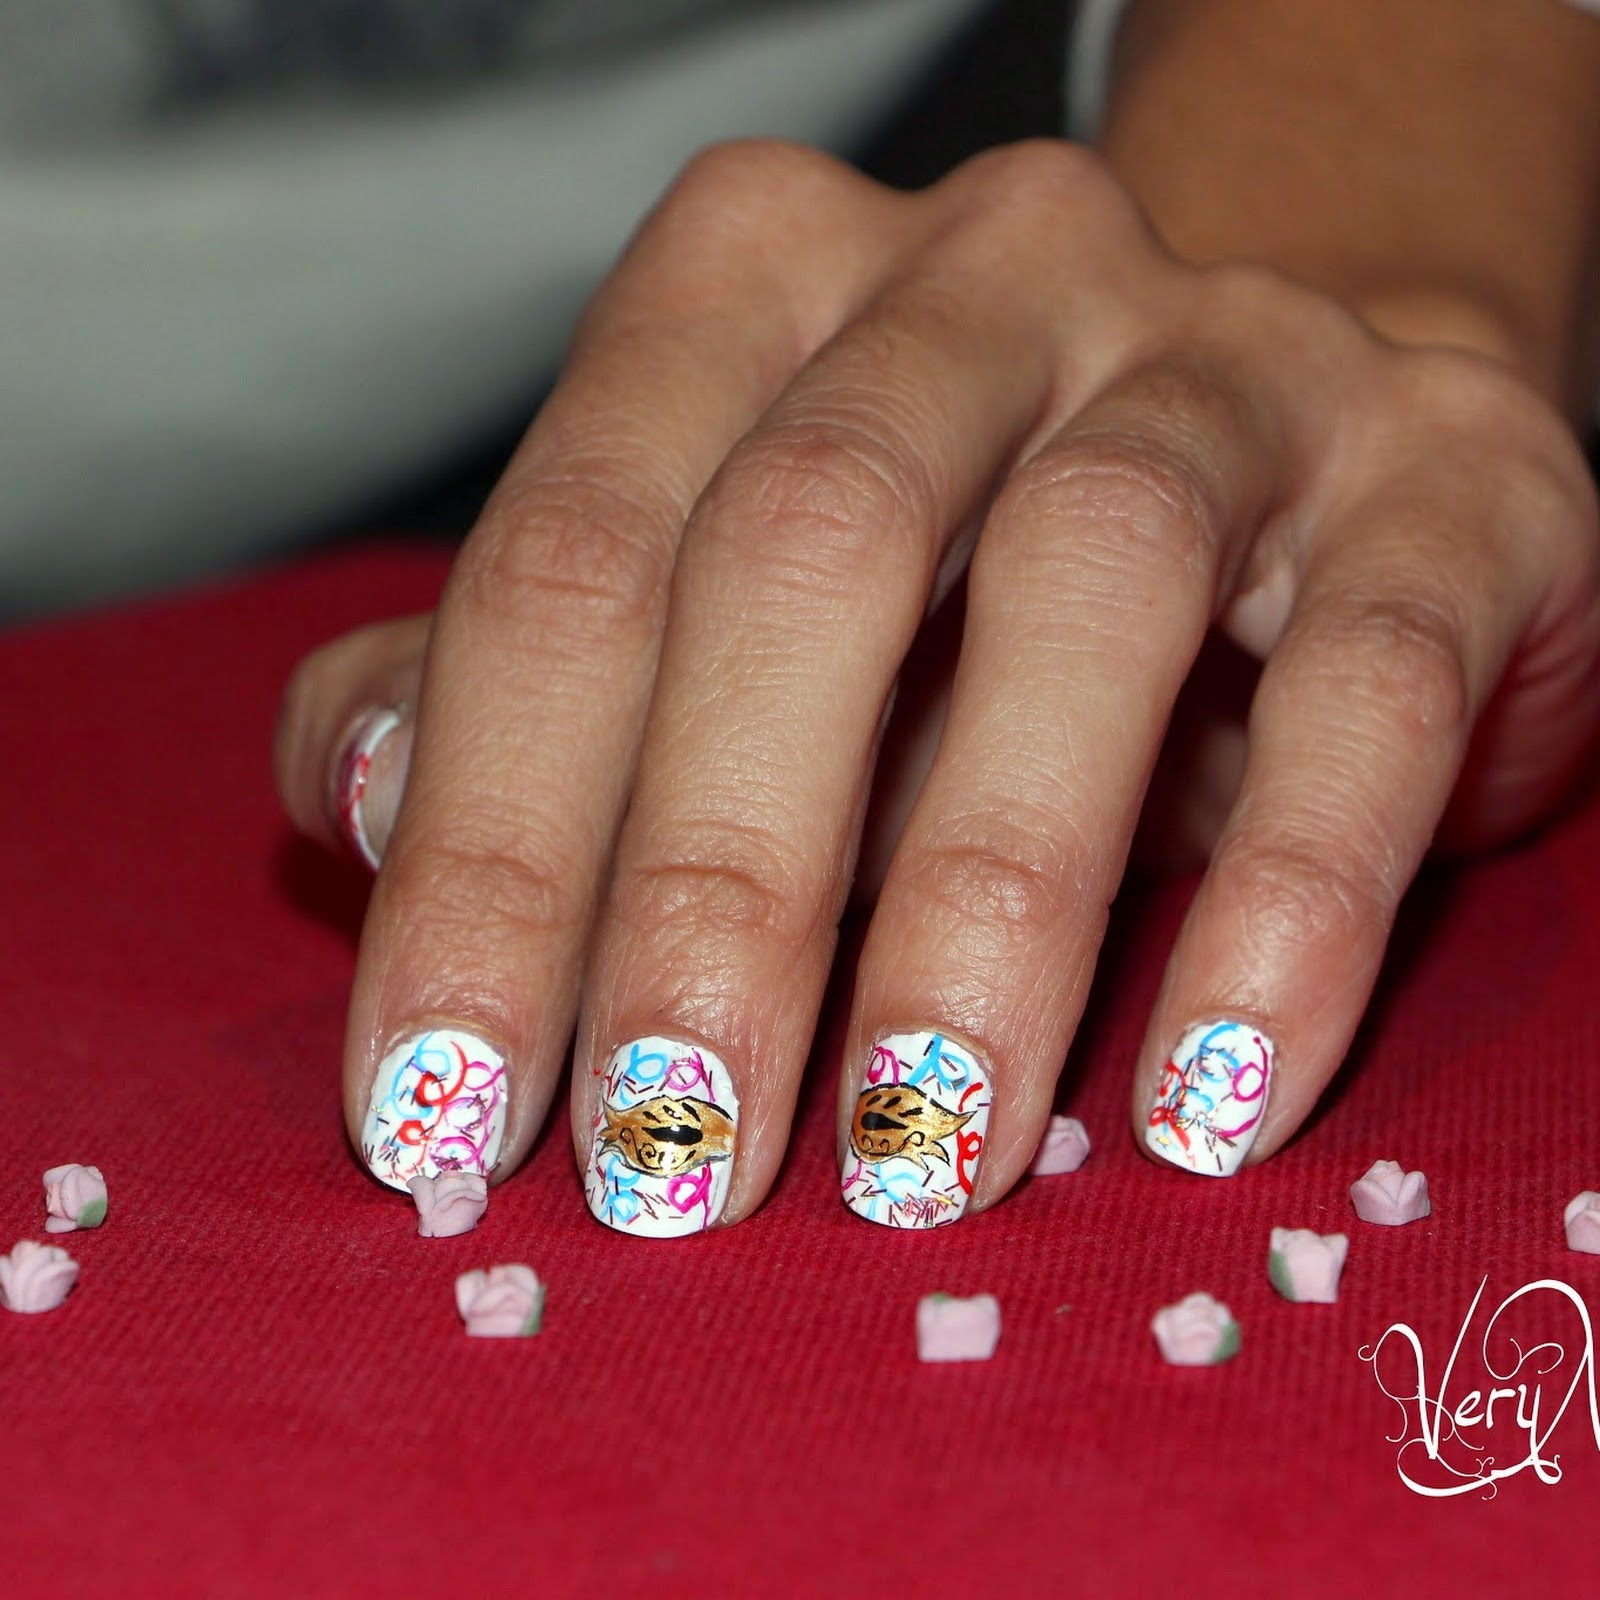 Febrero 2015 Verynailsart Blog De Uñas Decoradas Nail Art Paso